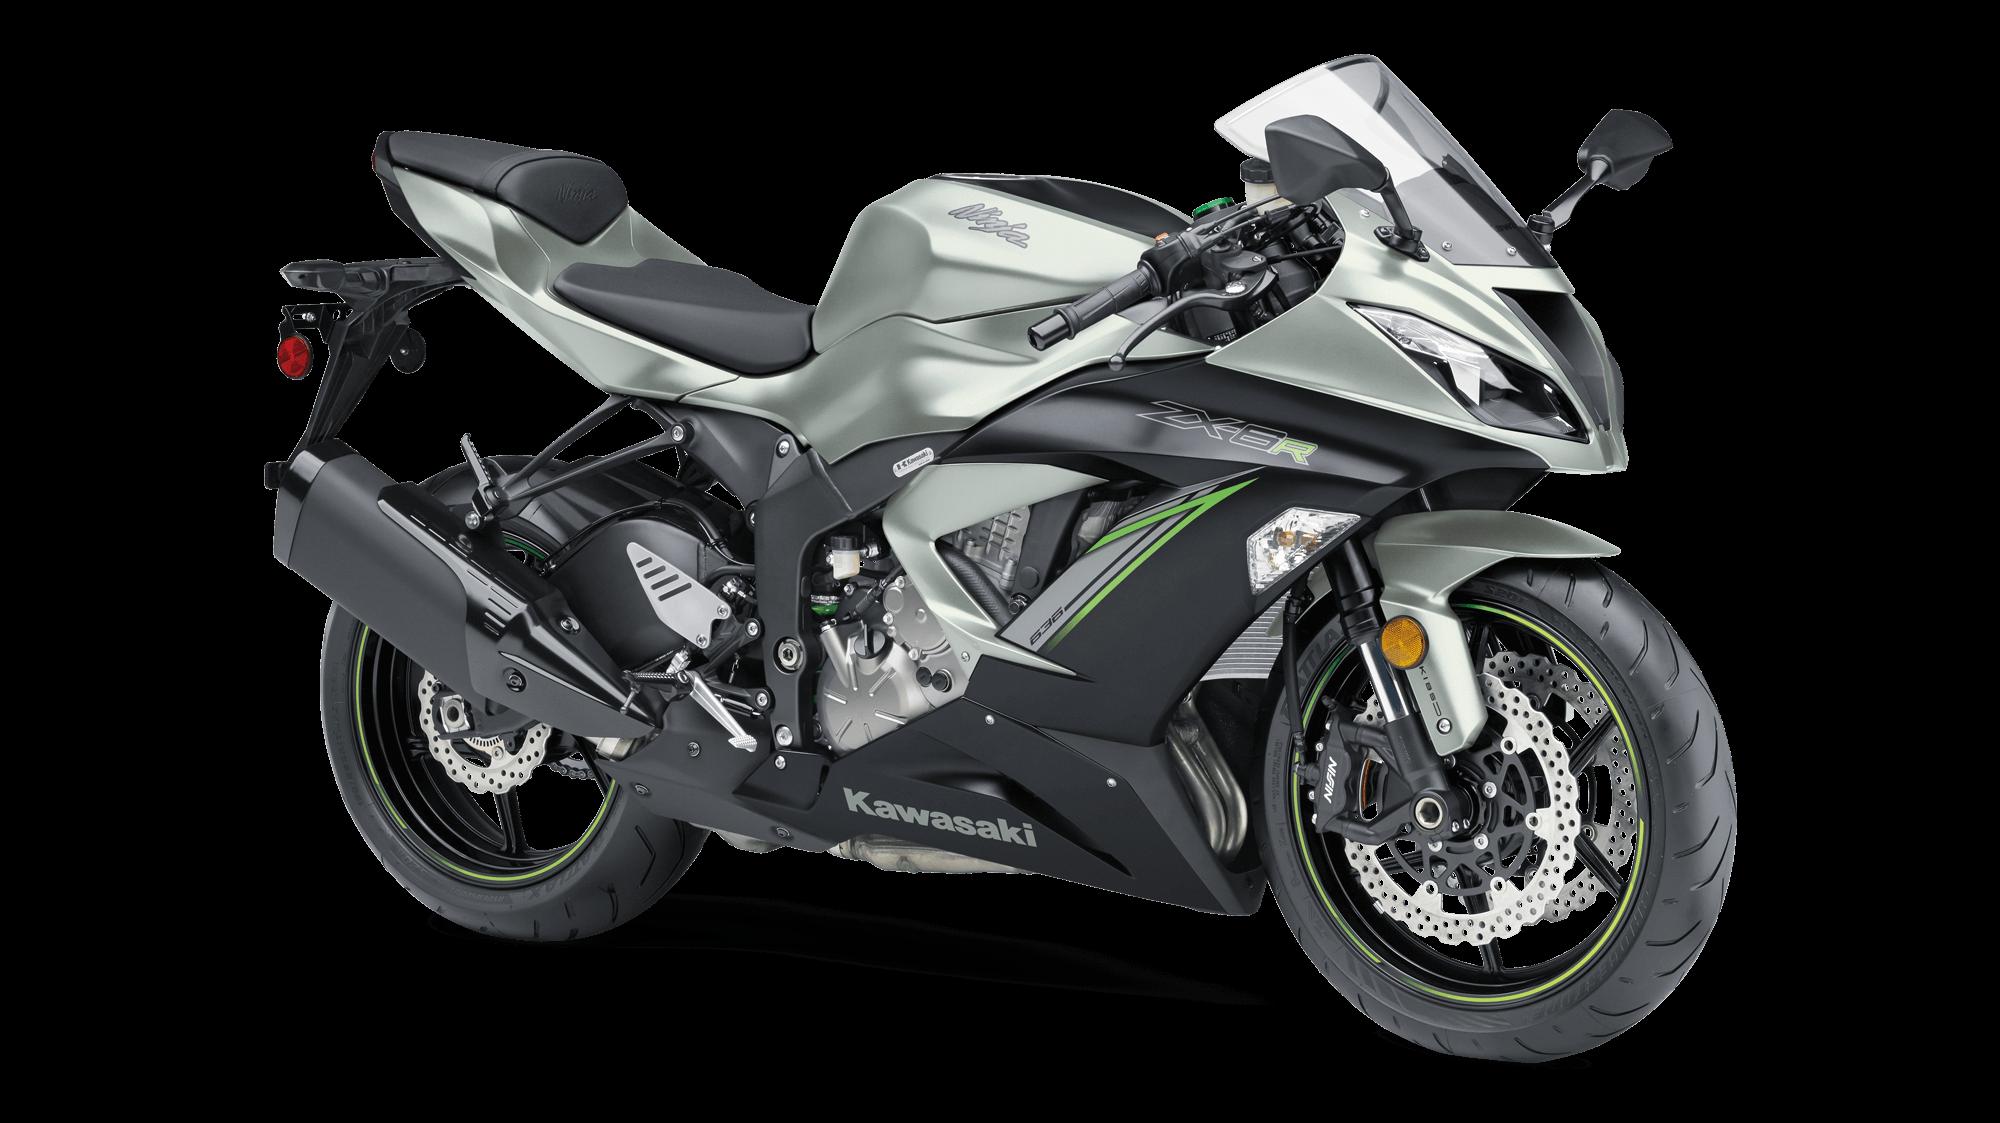 2018 Ninja Zx 6r Abs Supersport Motorcycle By Kawasaki Kawasaki